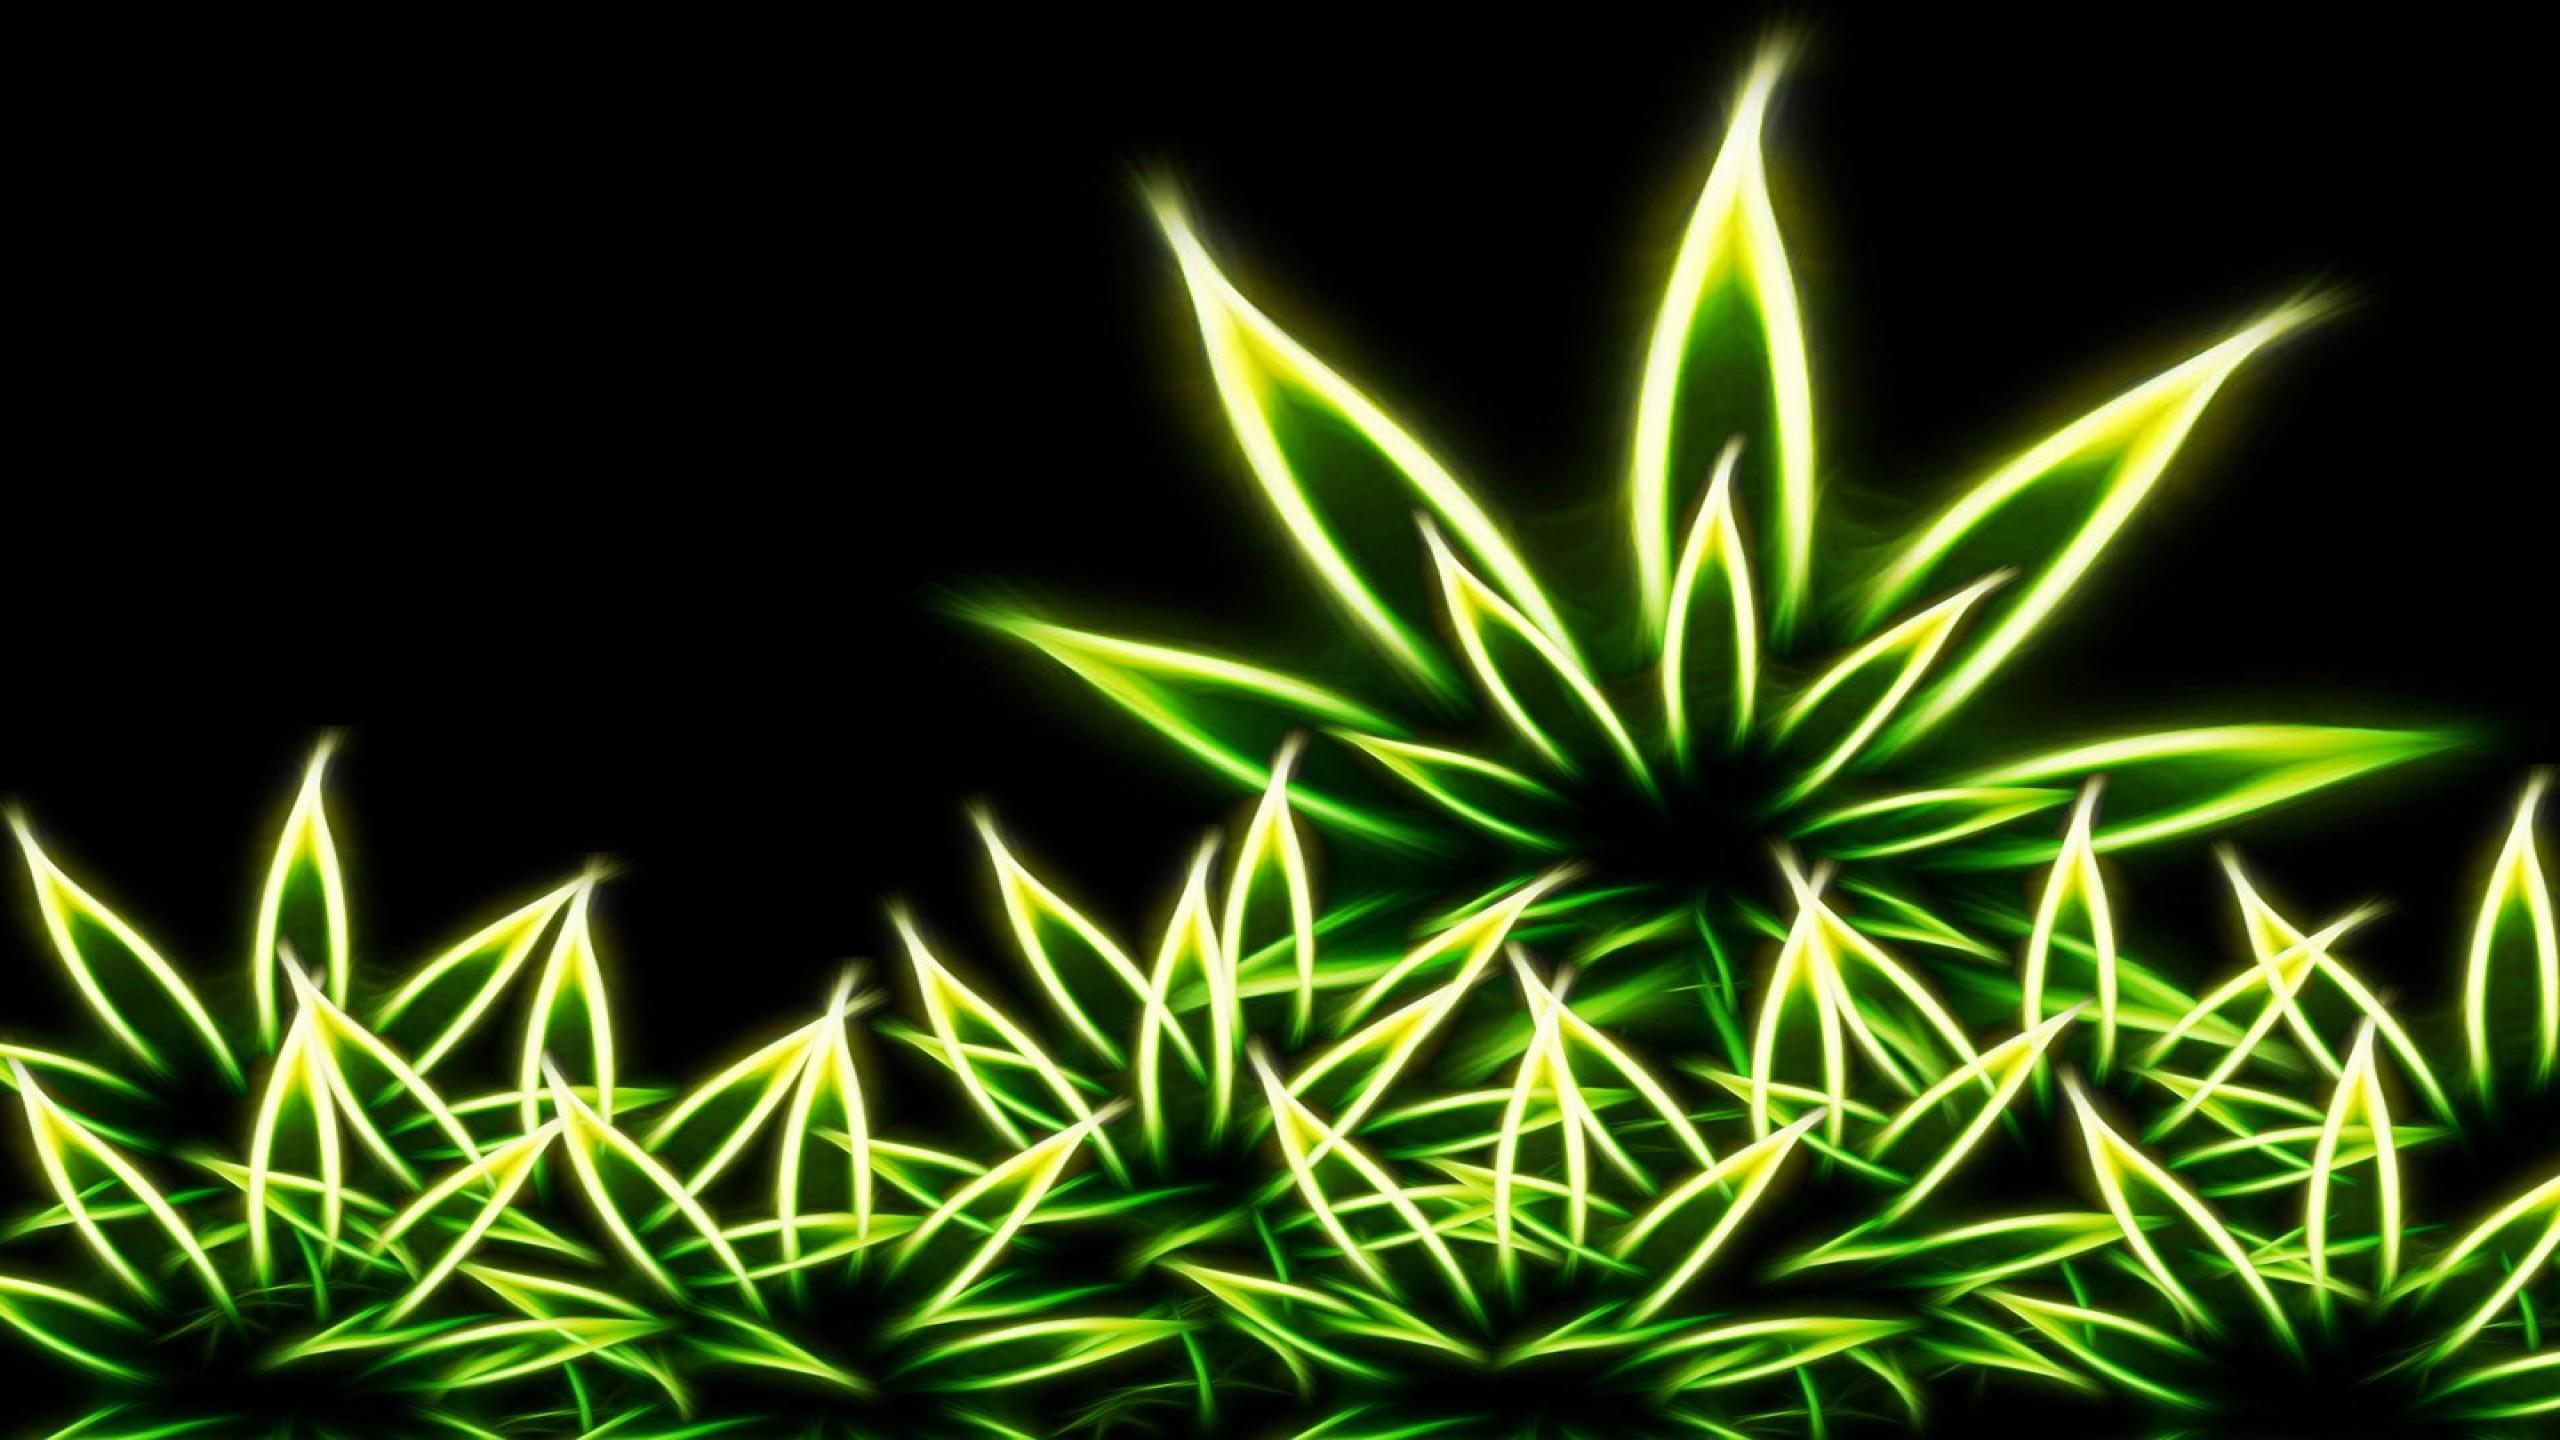 marijuana wallpaper 1680x1050 - photo #19